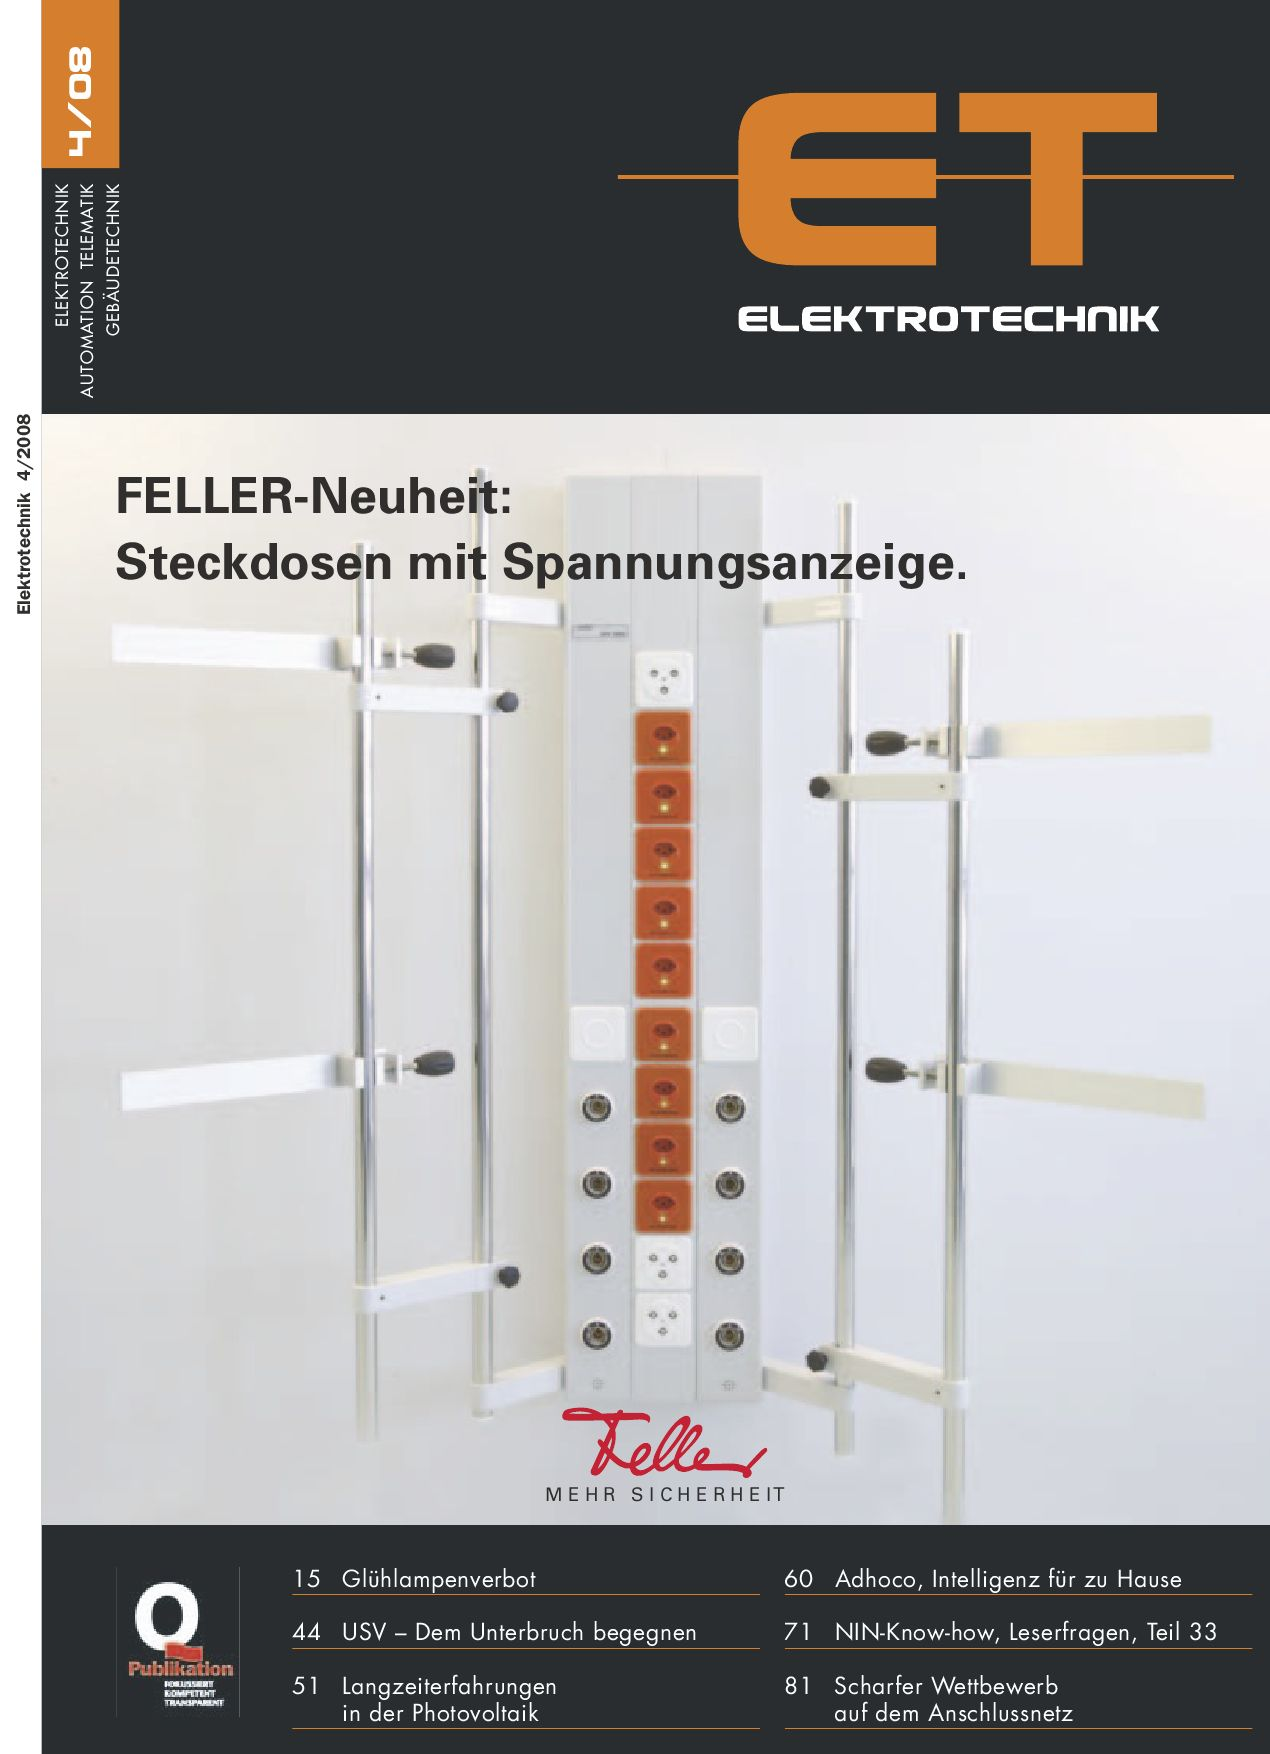 Elektrotechnik 2008/04 by Daniel Gugger - issuu